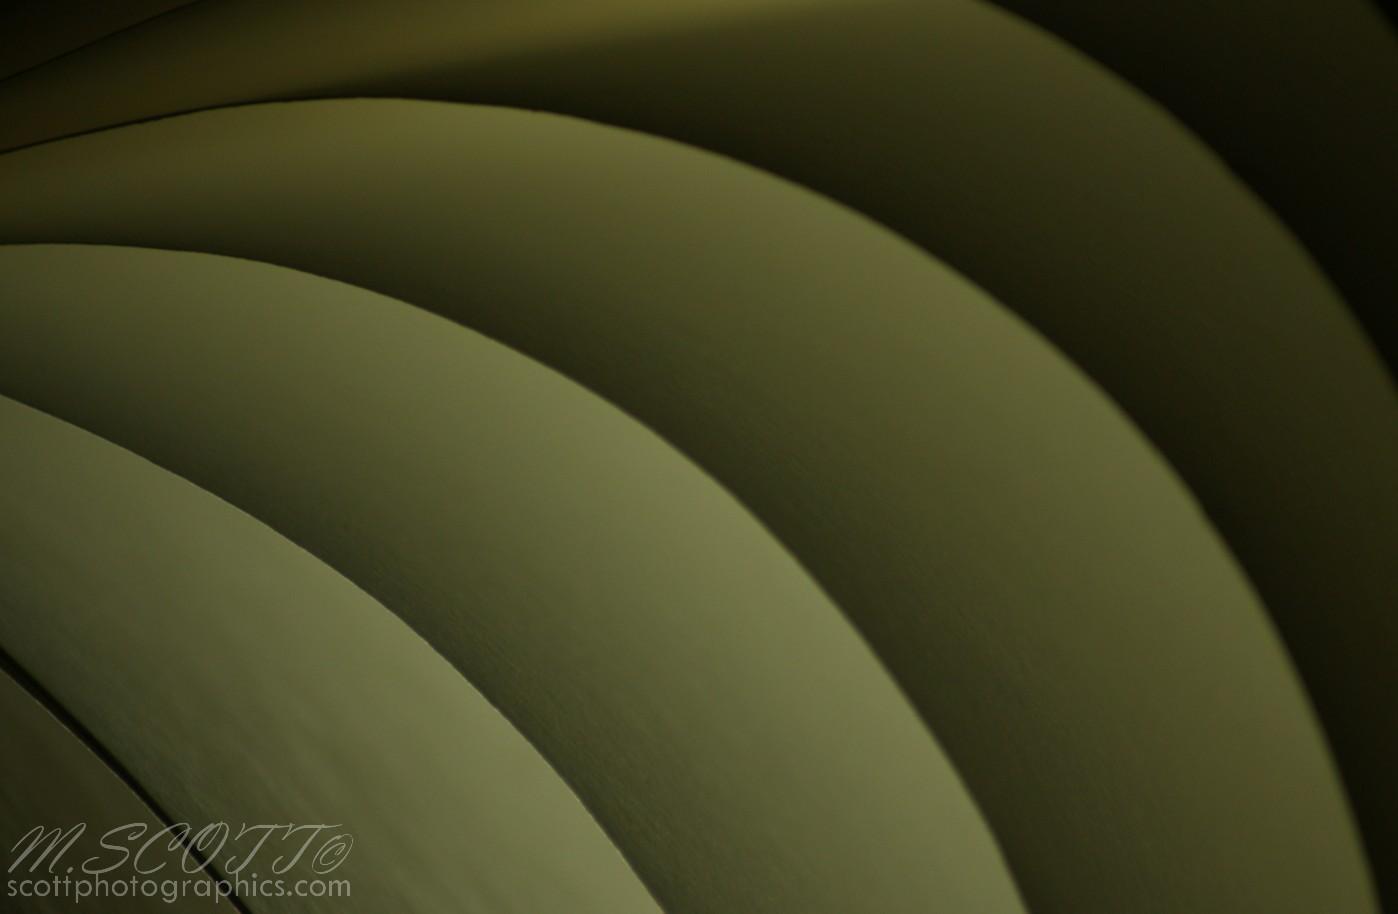 https://www.images.scottphotographics.com/paper-sculptures-lighting-diy/paper-sculptures-lighting-diy-6.jpg